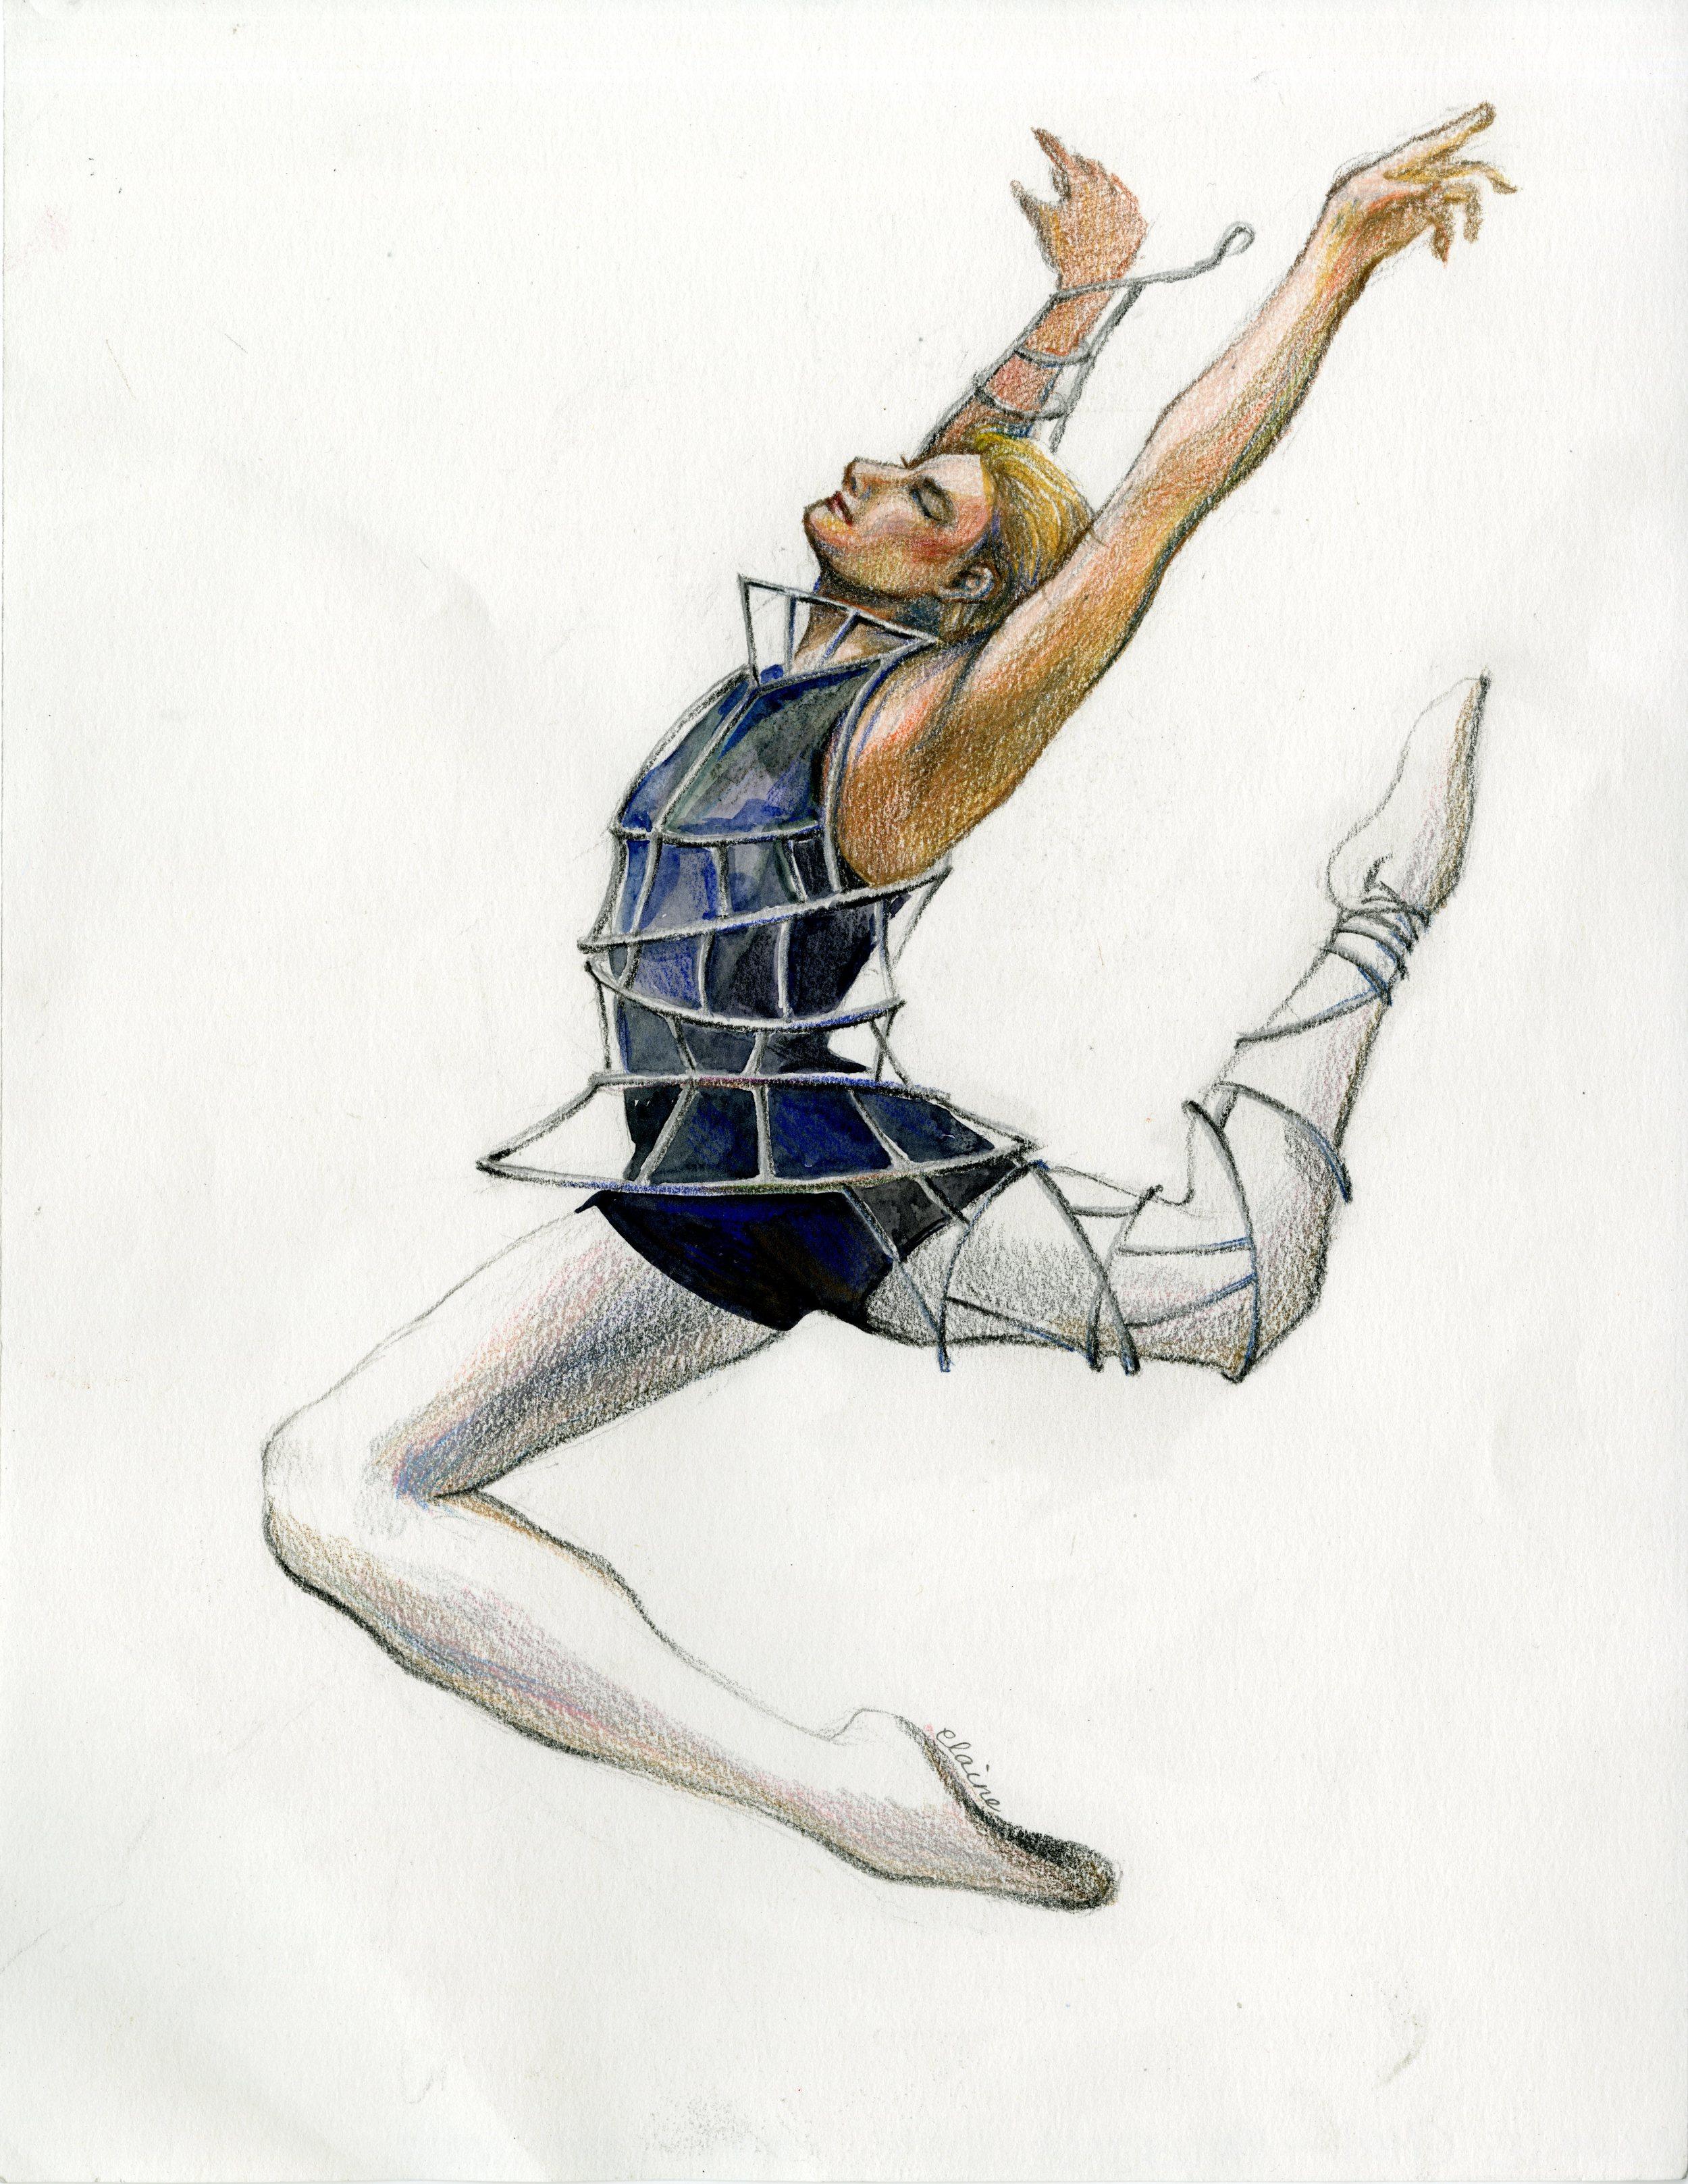 Ballerina, Jump, Open, Arrogant   Water-soluble color pencil